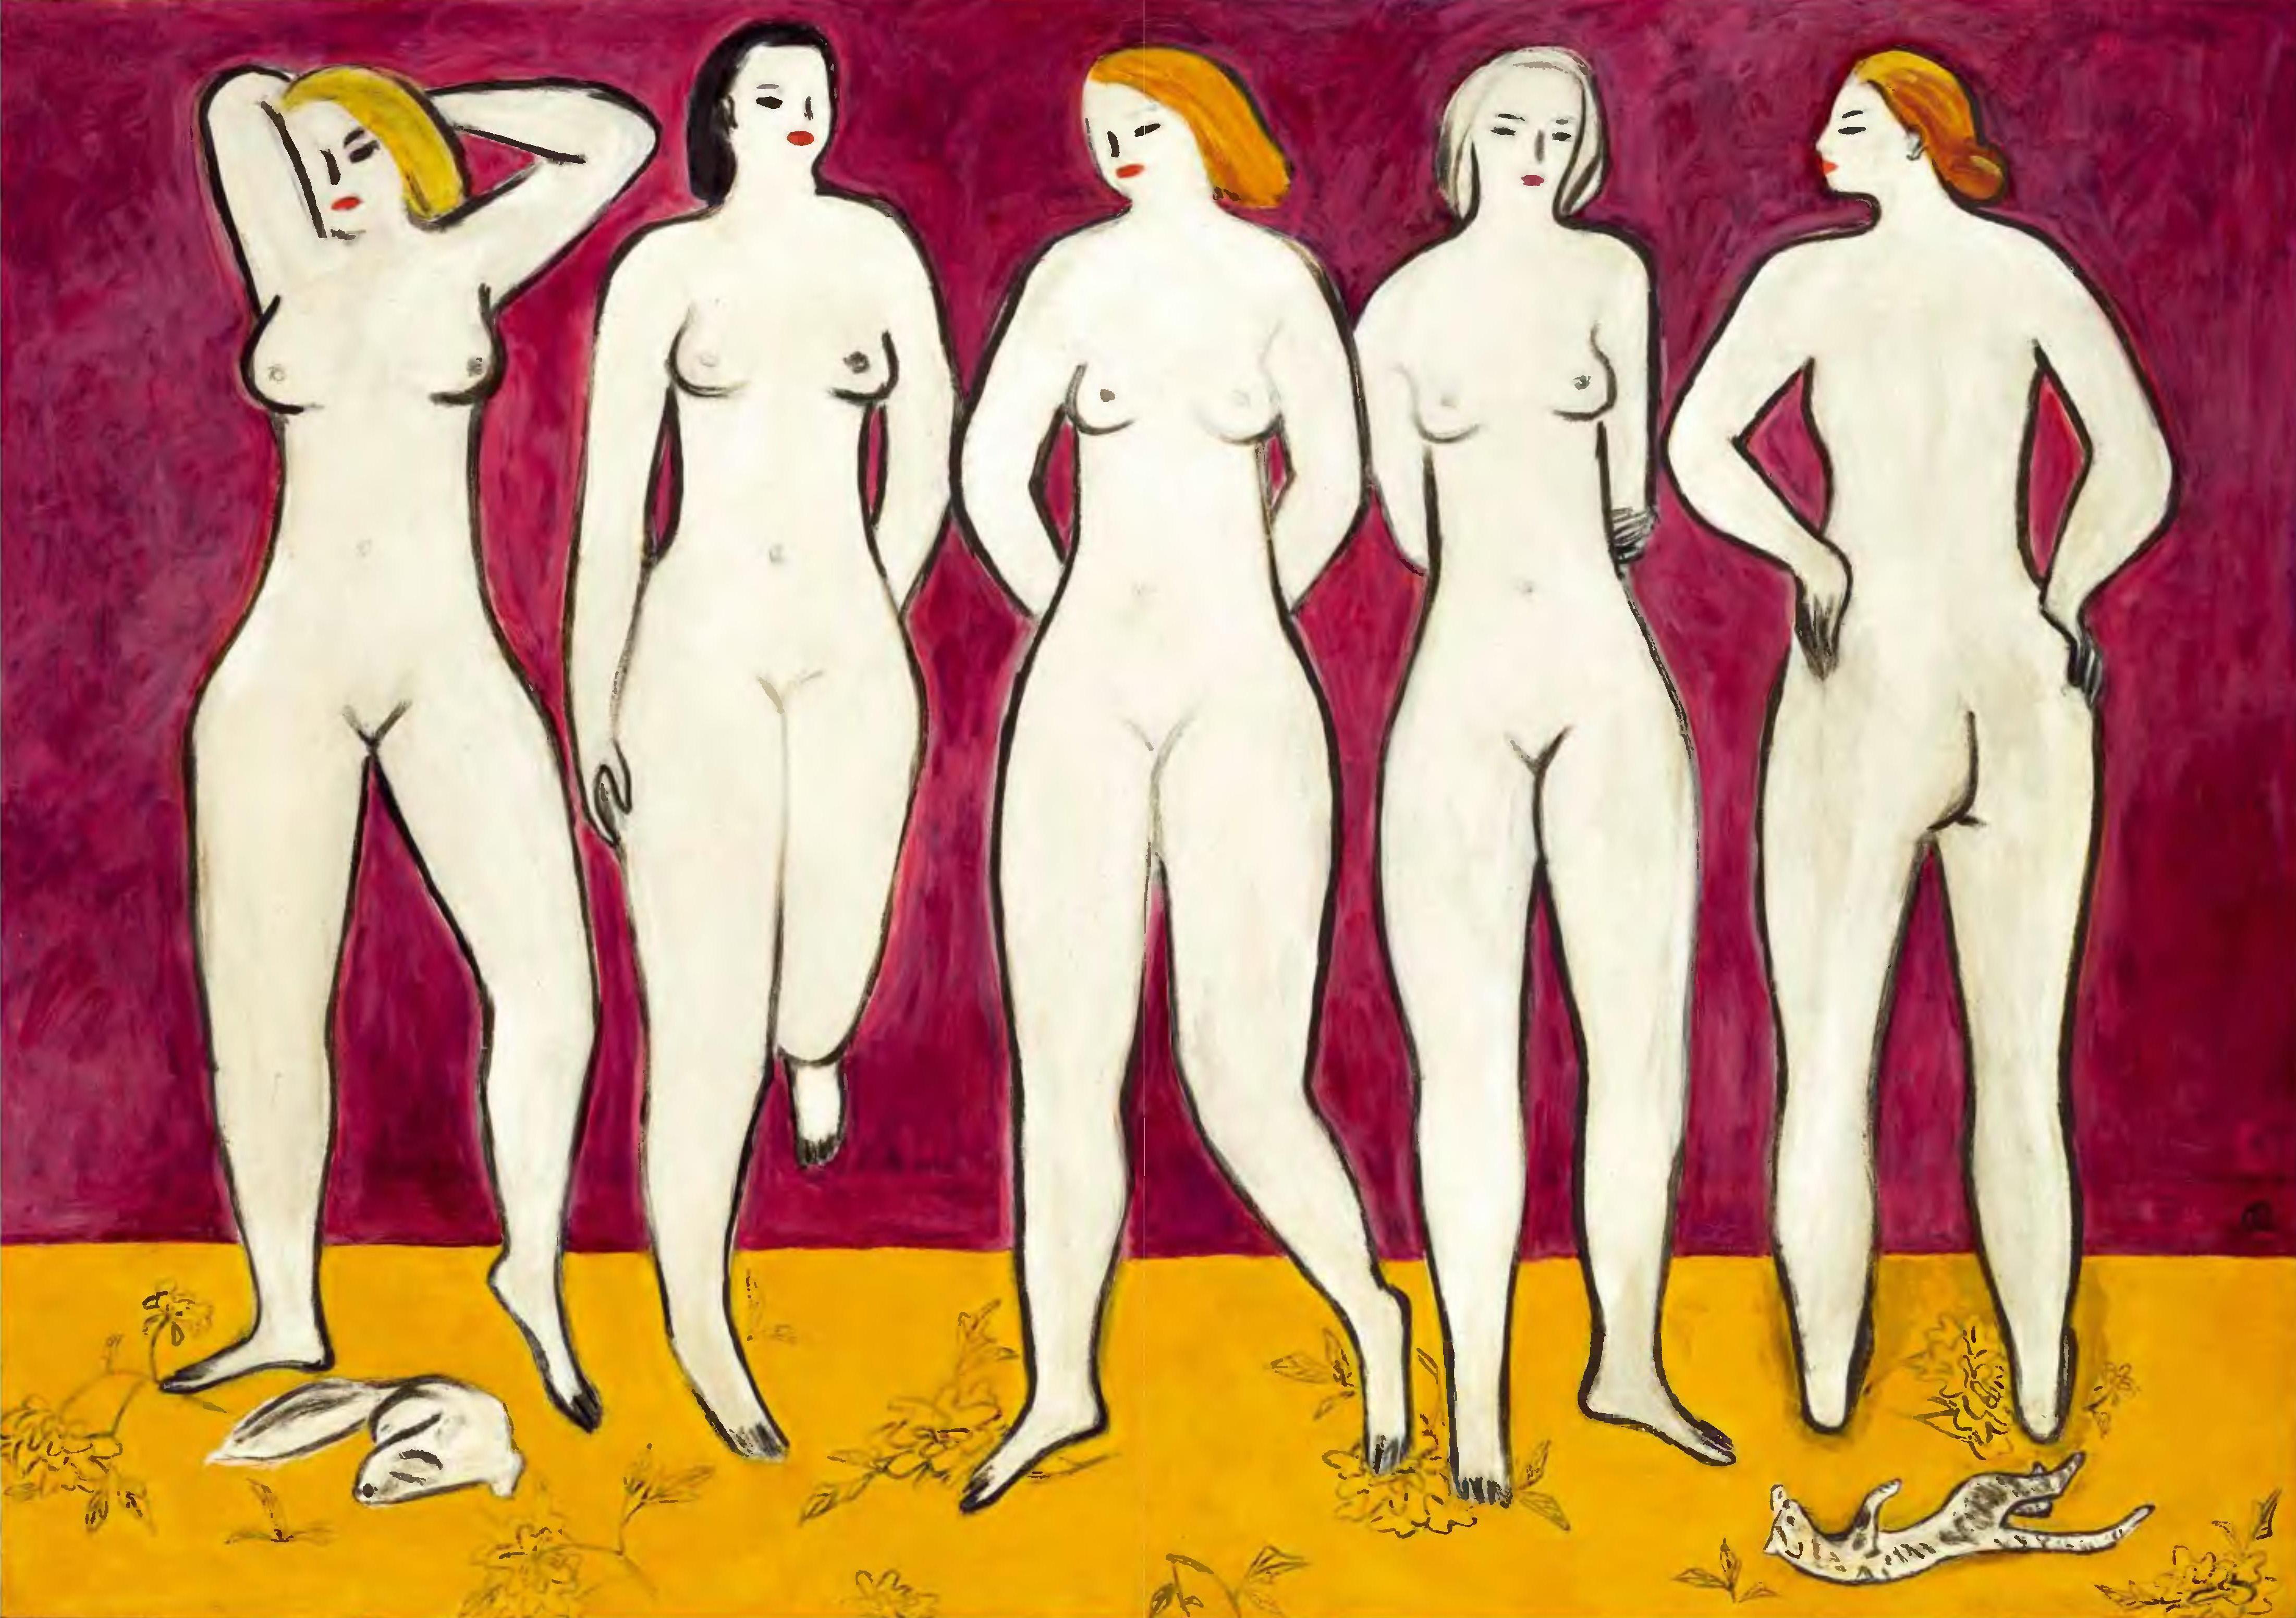 Sanyu - Five Nudes (五裸女) (1950)